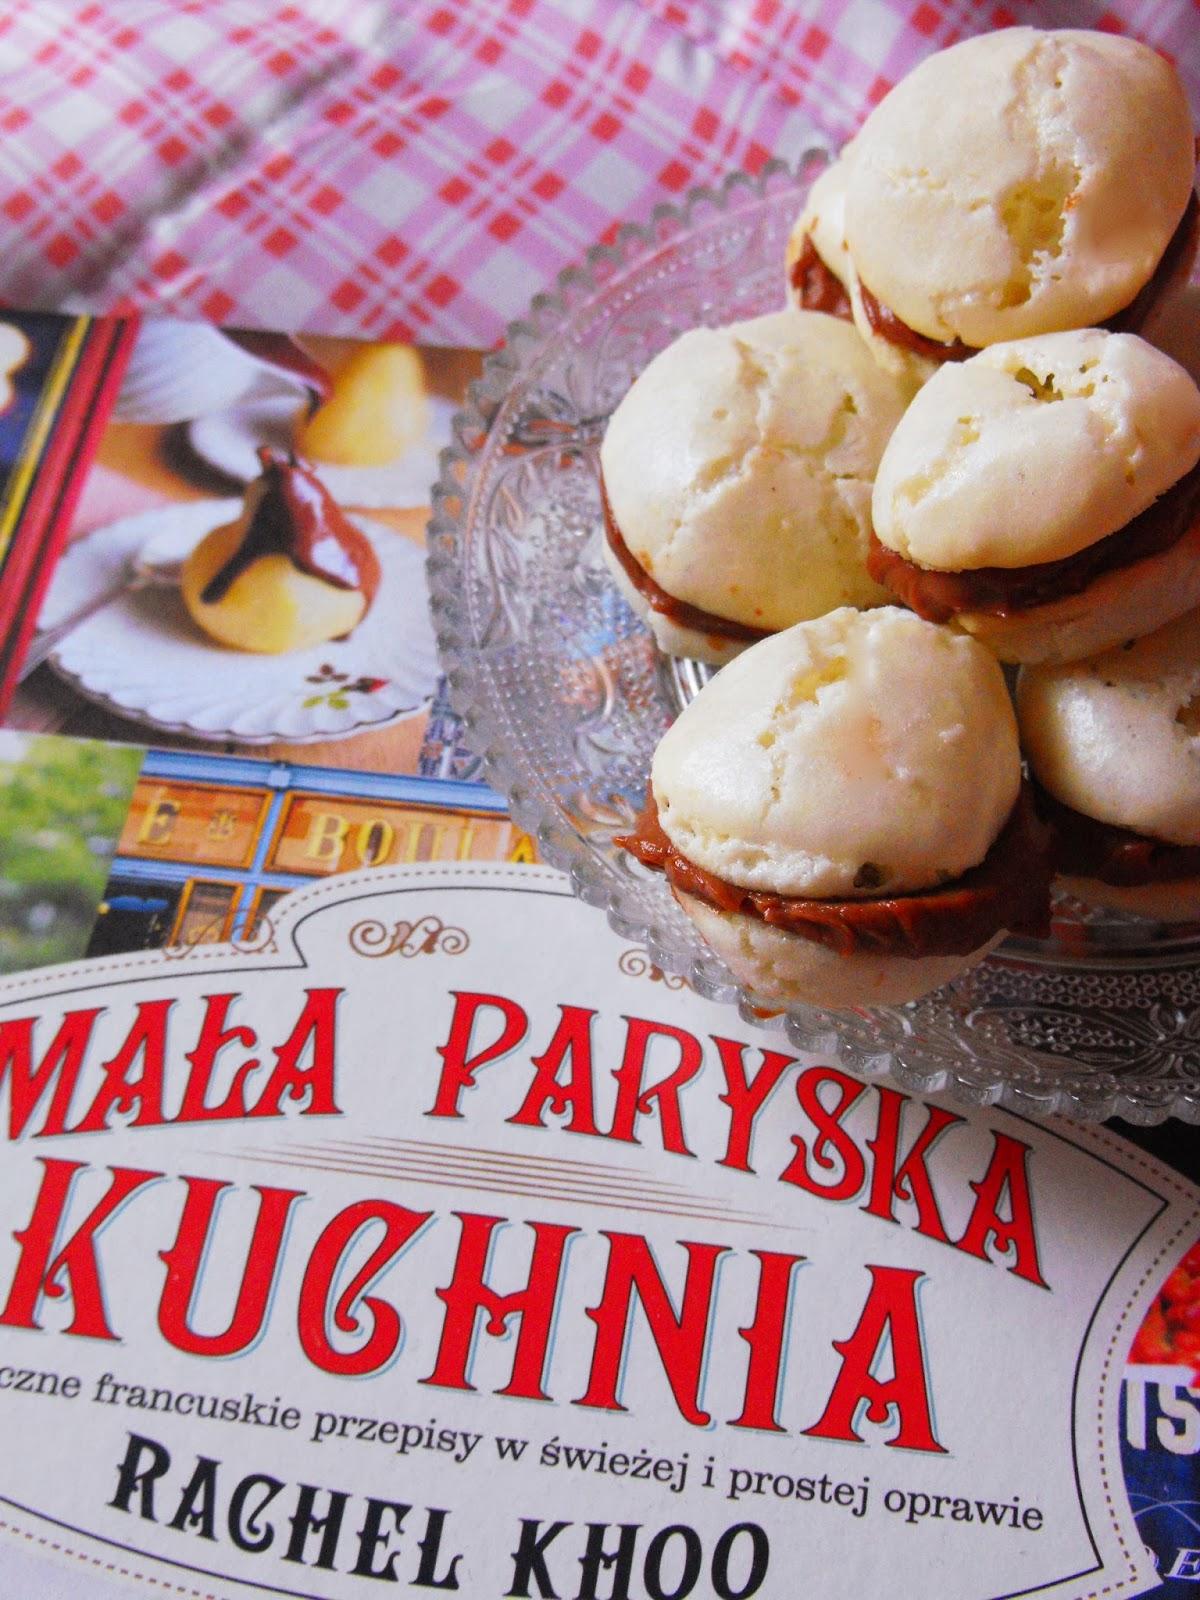 http://teczawsloiku.blogspot.com/2014/02/makaroniki-moje-pierwsze-kulinarne.html